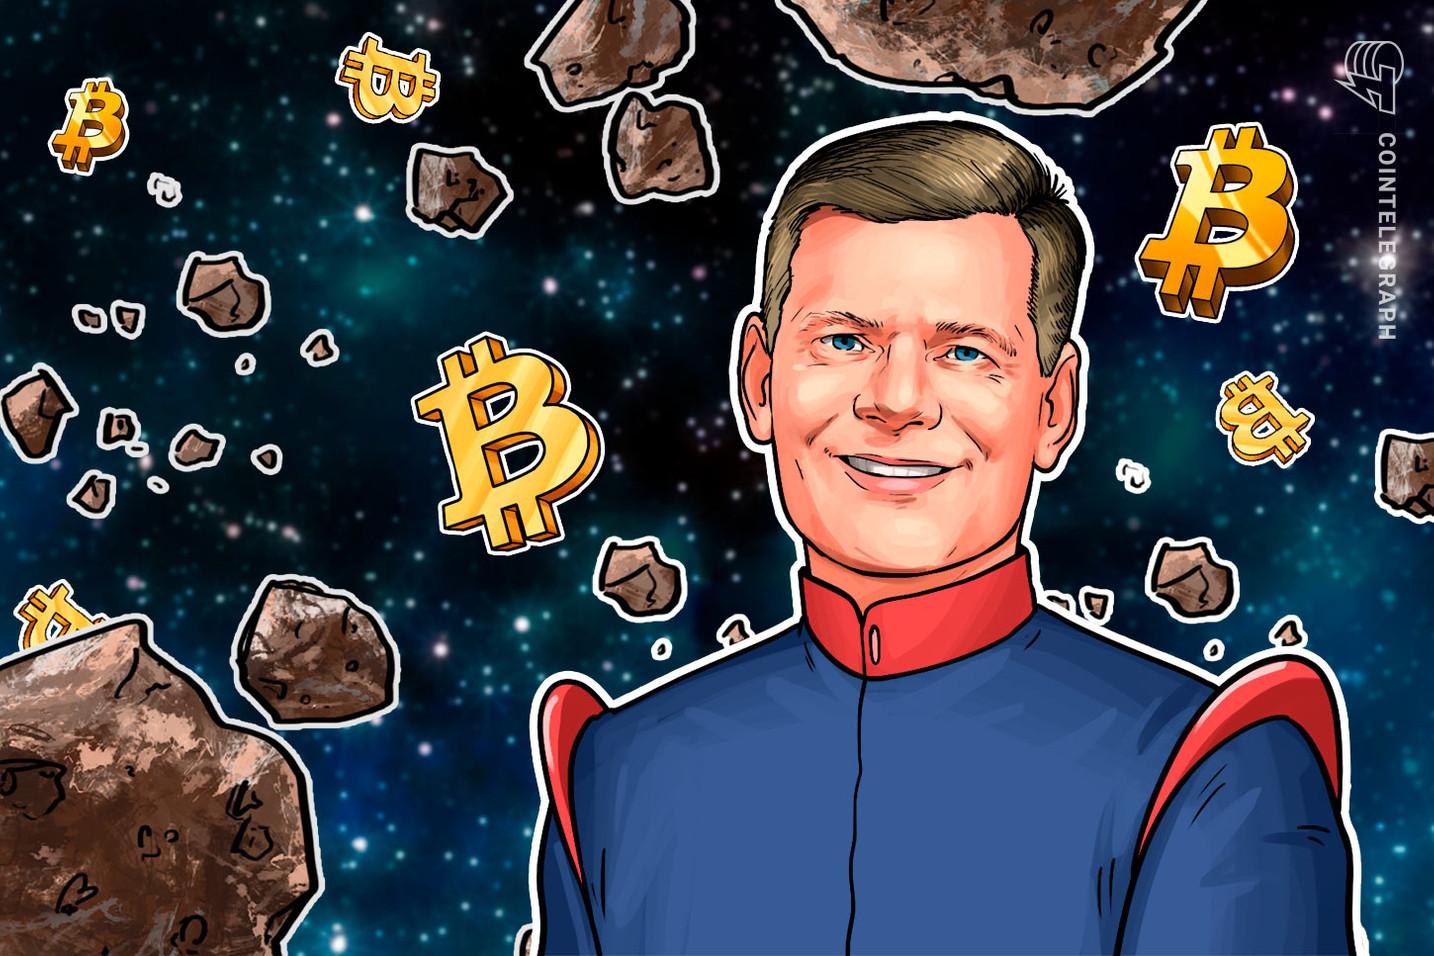 When to Sell Bitcoin? 'Never' — Mark Yusko Says BTC Like Amazon Stock